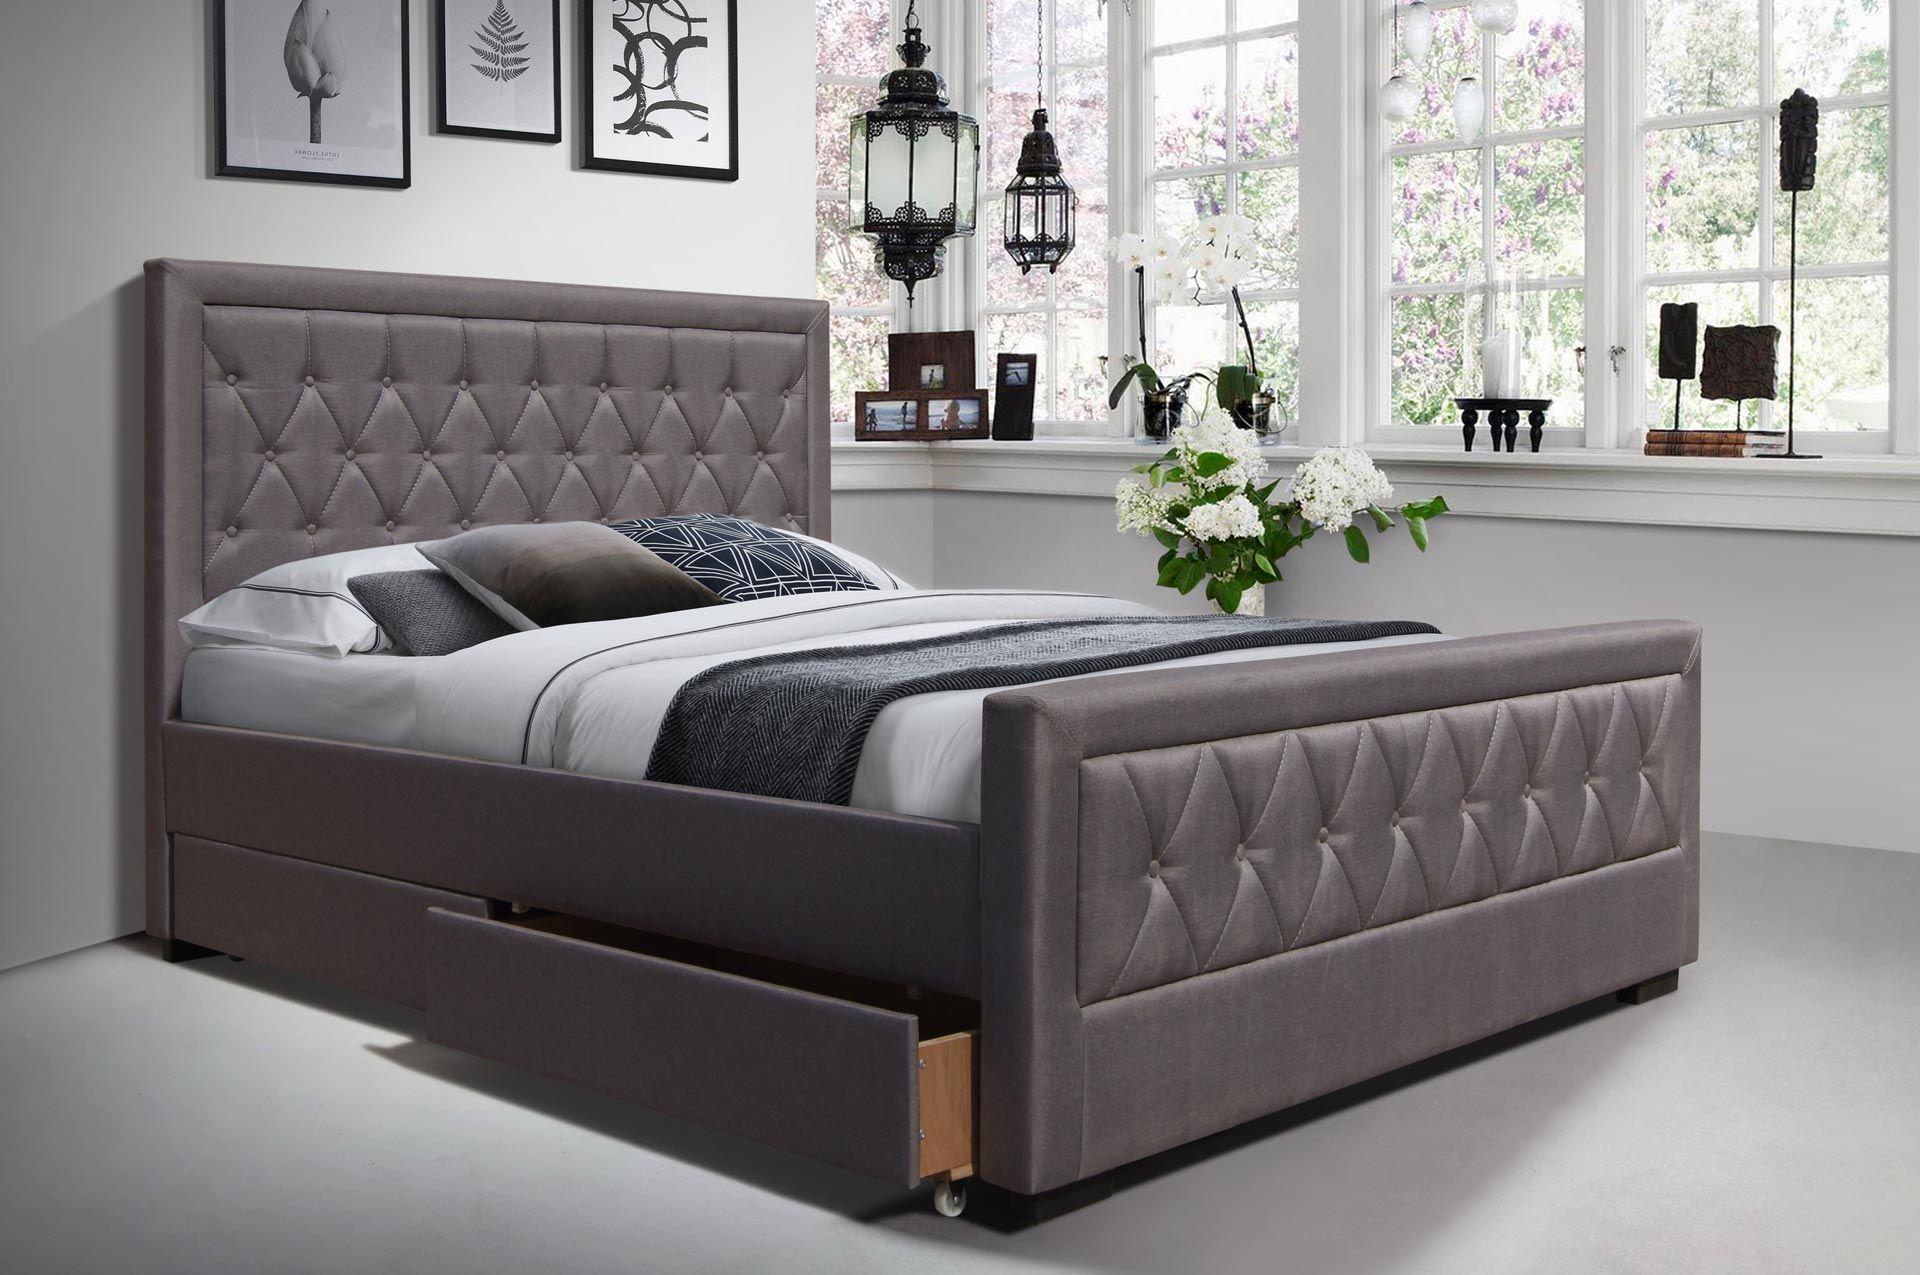 Bedroom Athlone Furniture World Westmeath